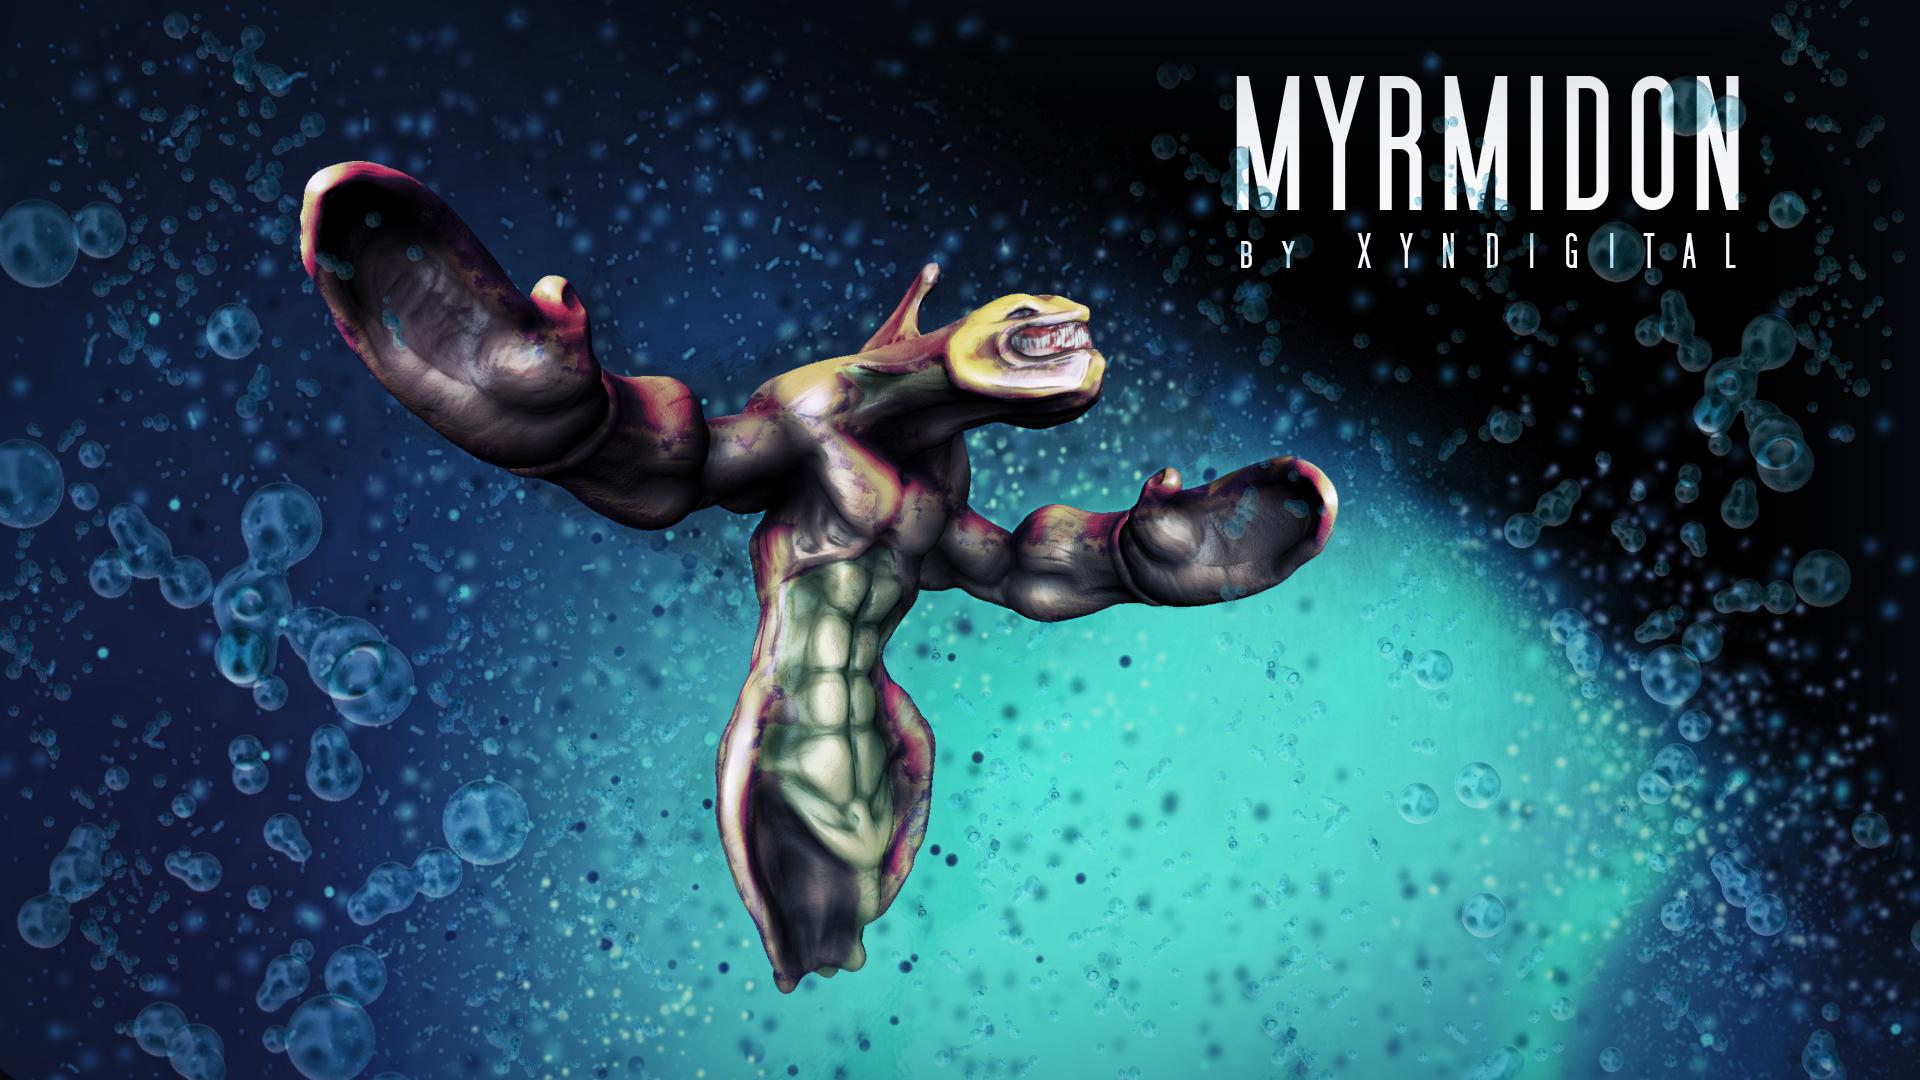 Myrmidon | Character Concept